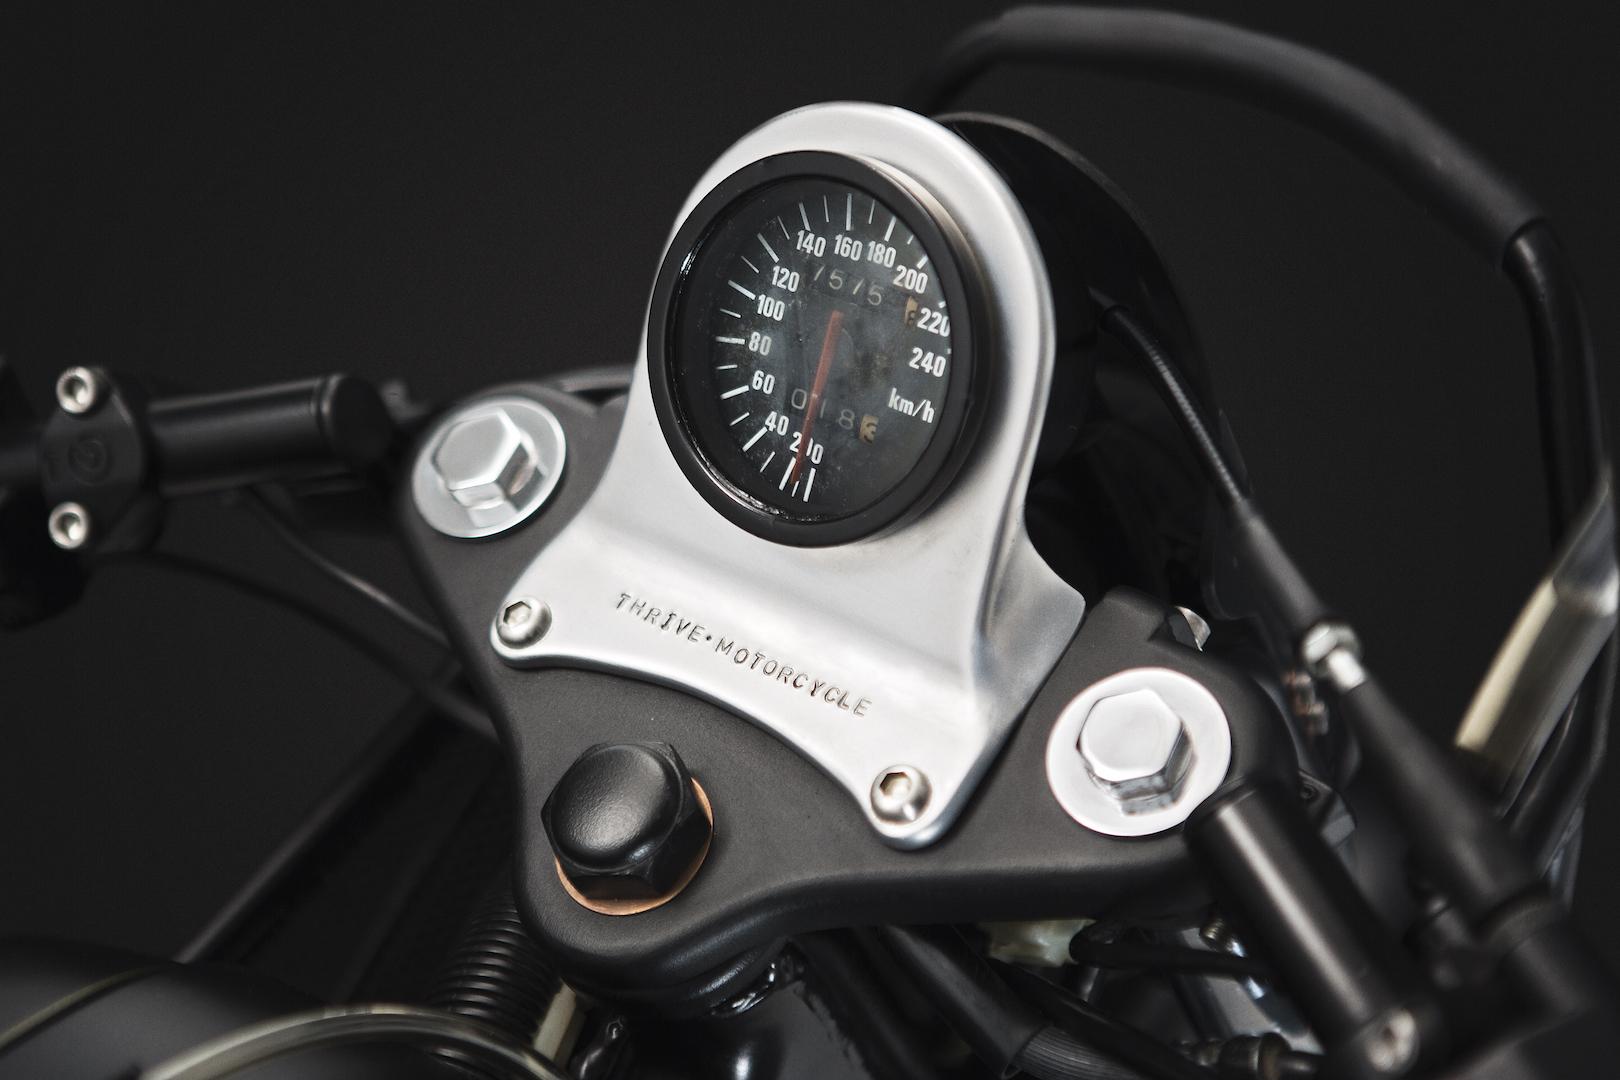 Thrive_Motorcycles_T009_Honda_CB250_Custom_Moto-Mucci (4).jpg